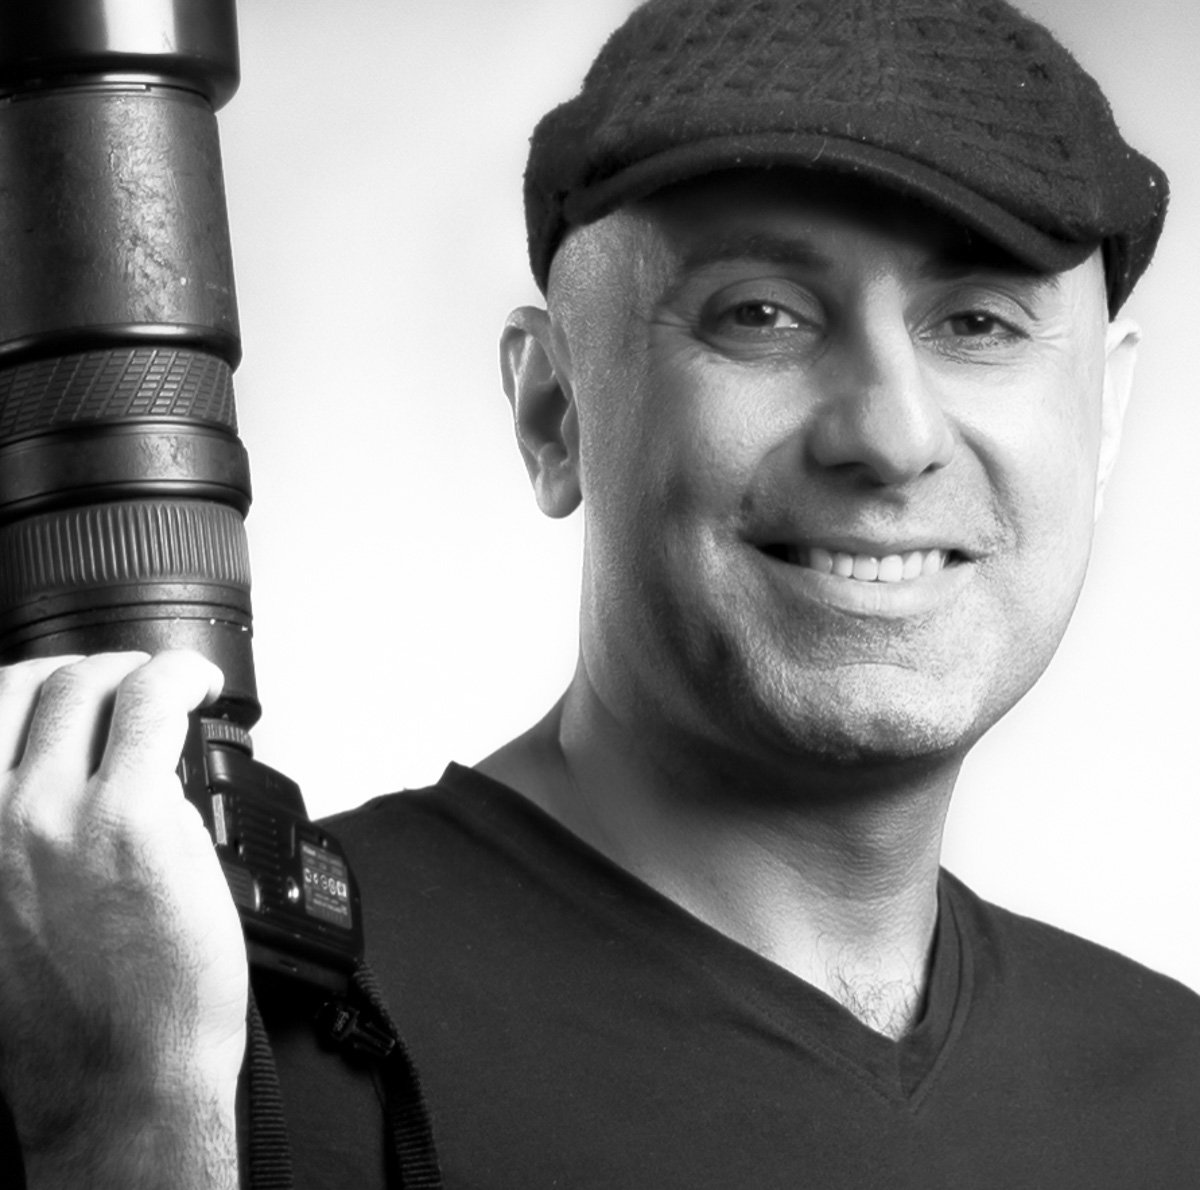 Portrait-Photography-Atlanta-HD-shot-StudioArash-72-res-RPS-group-068-Edit-1-Edit-08.jpg